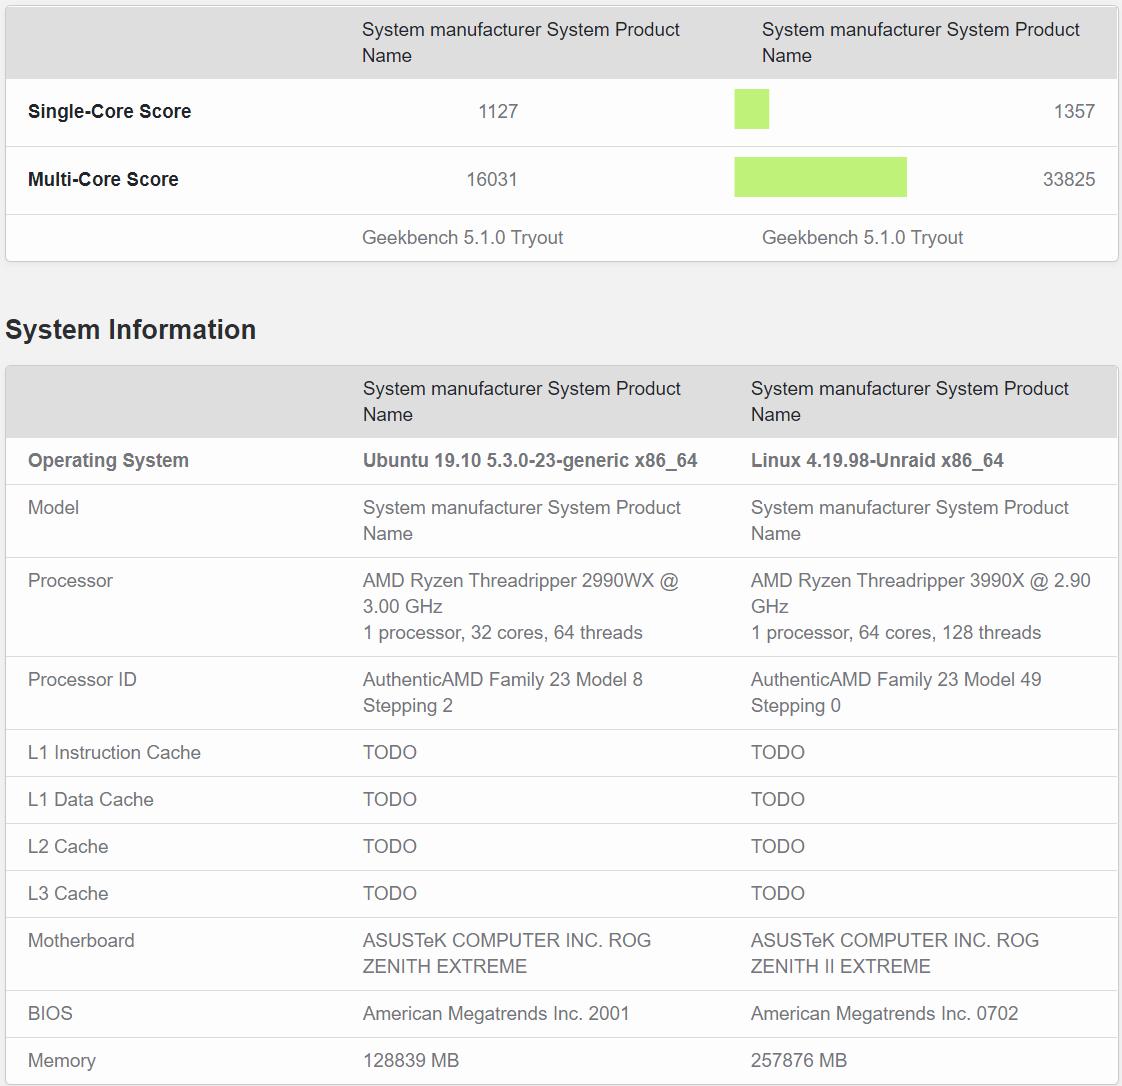 AMD-Ryzen-Threadripper-3990X-Geekbench-5-64-Core-CPU-Benchmark-vs-Ryzen-Threadripper-2990WX